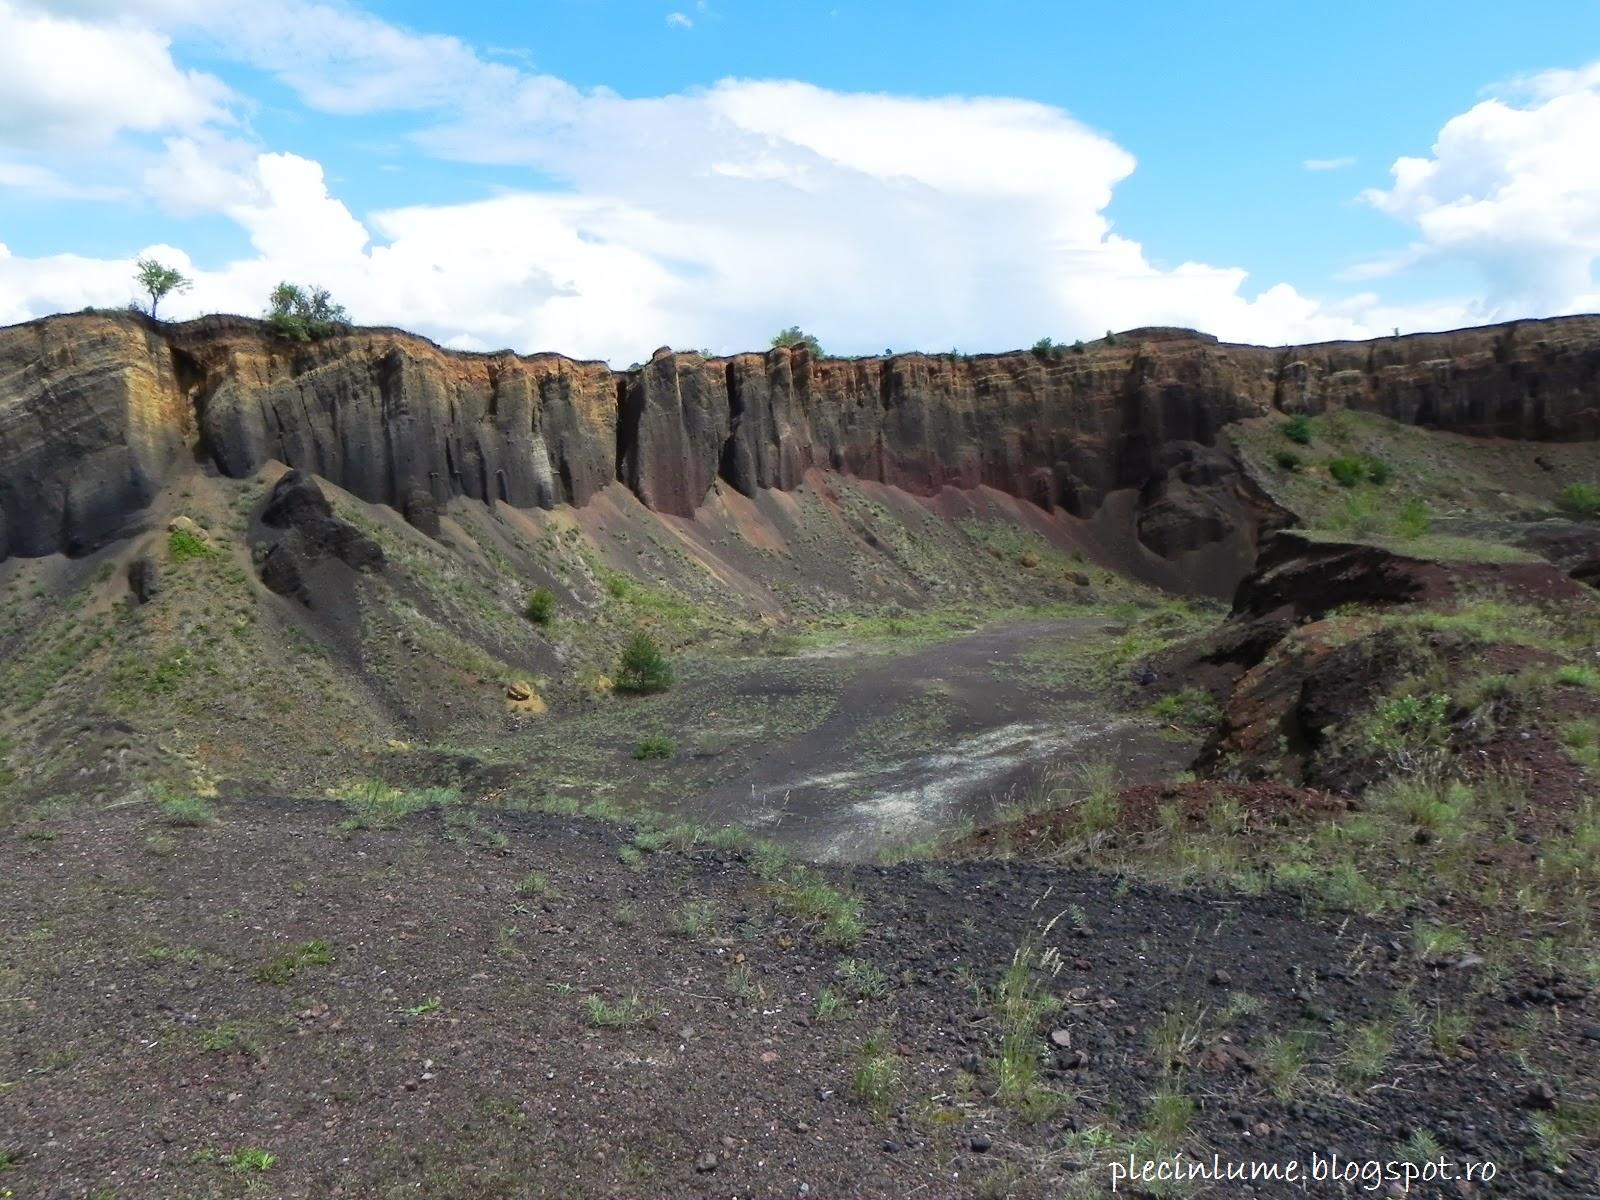 In craterul vulcanului de la Racos